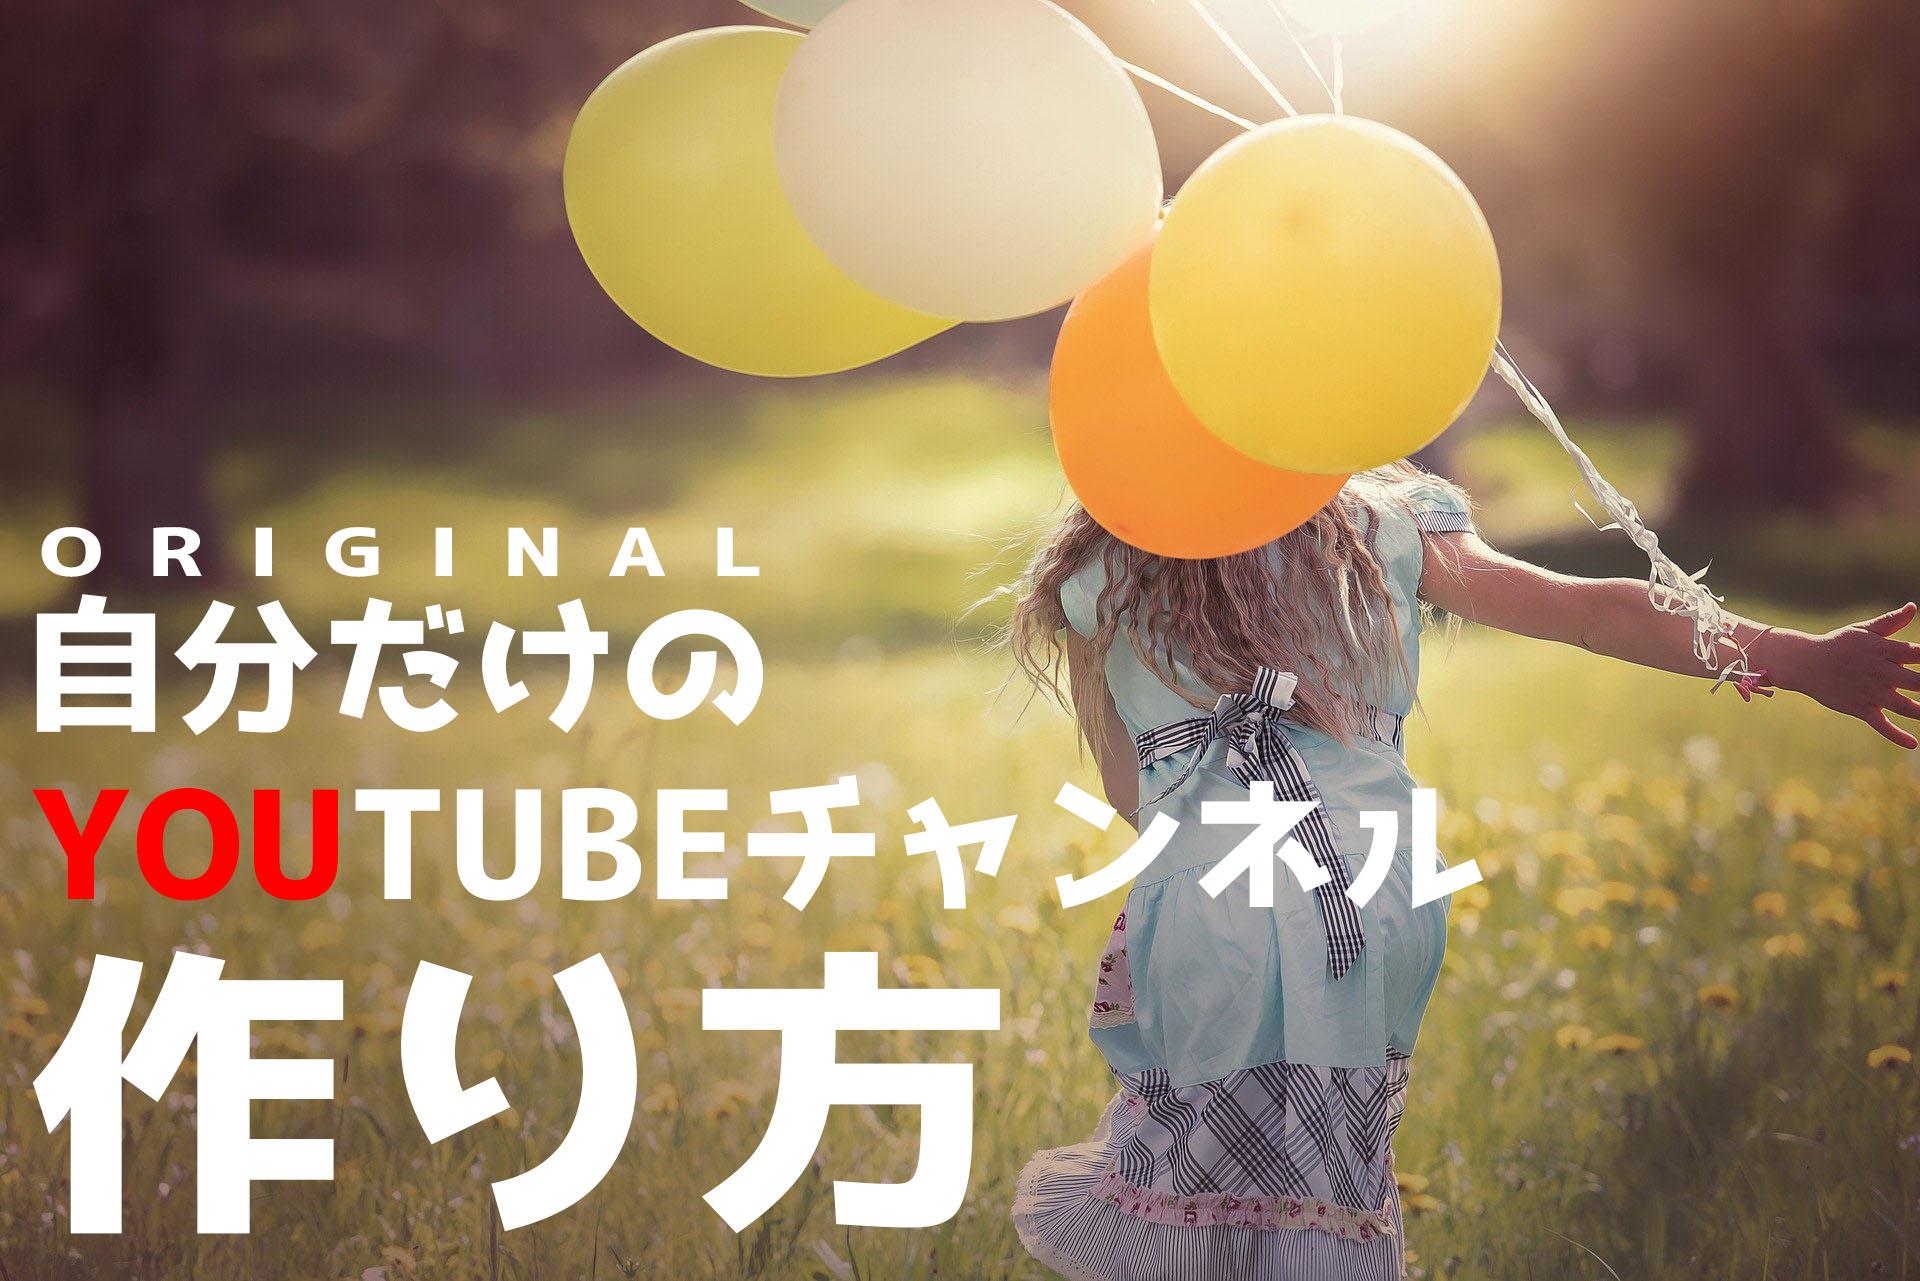 YOUTUBE,チャンネル,作り方